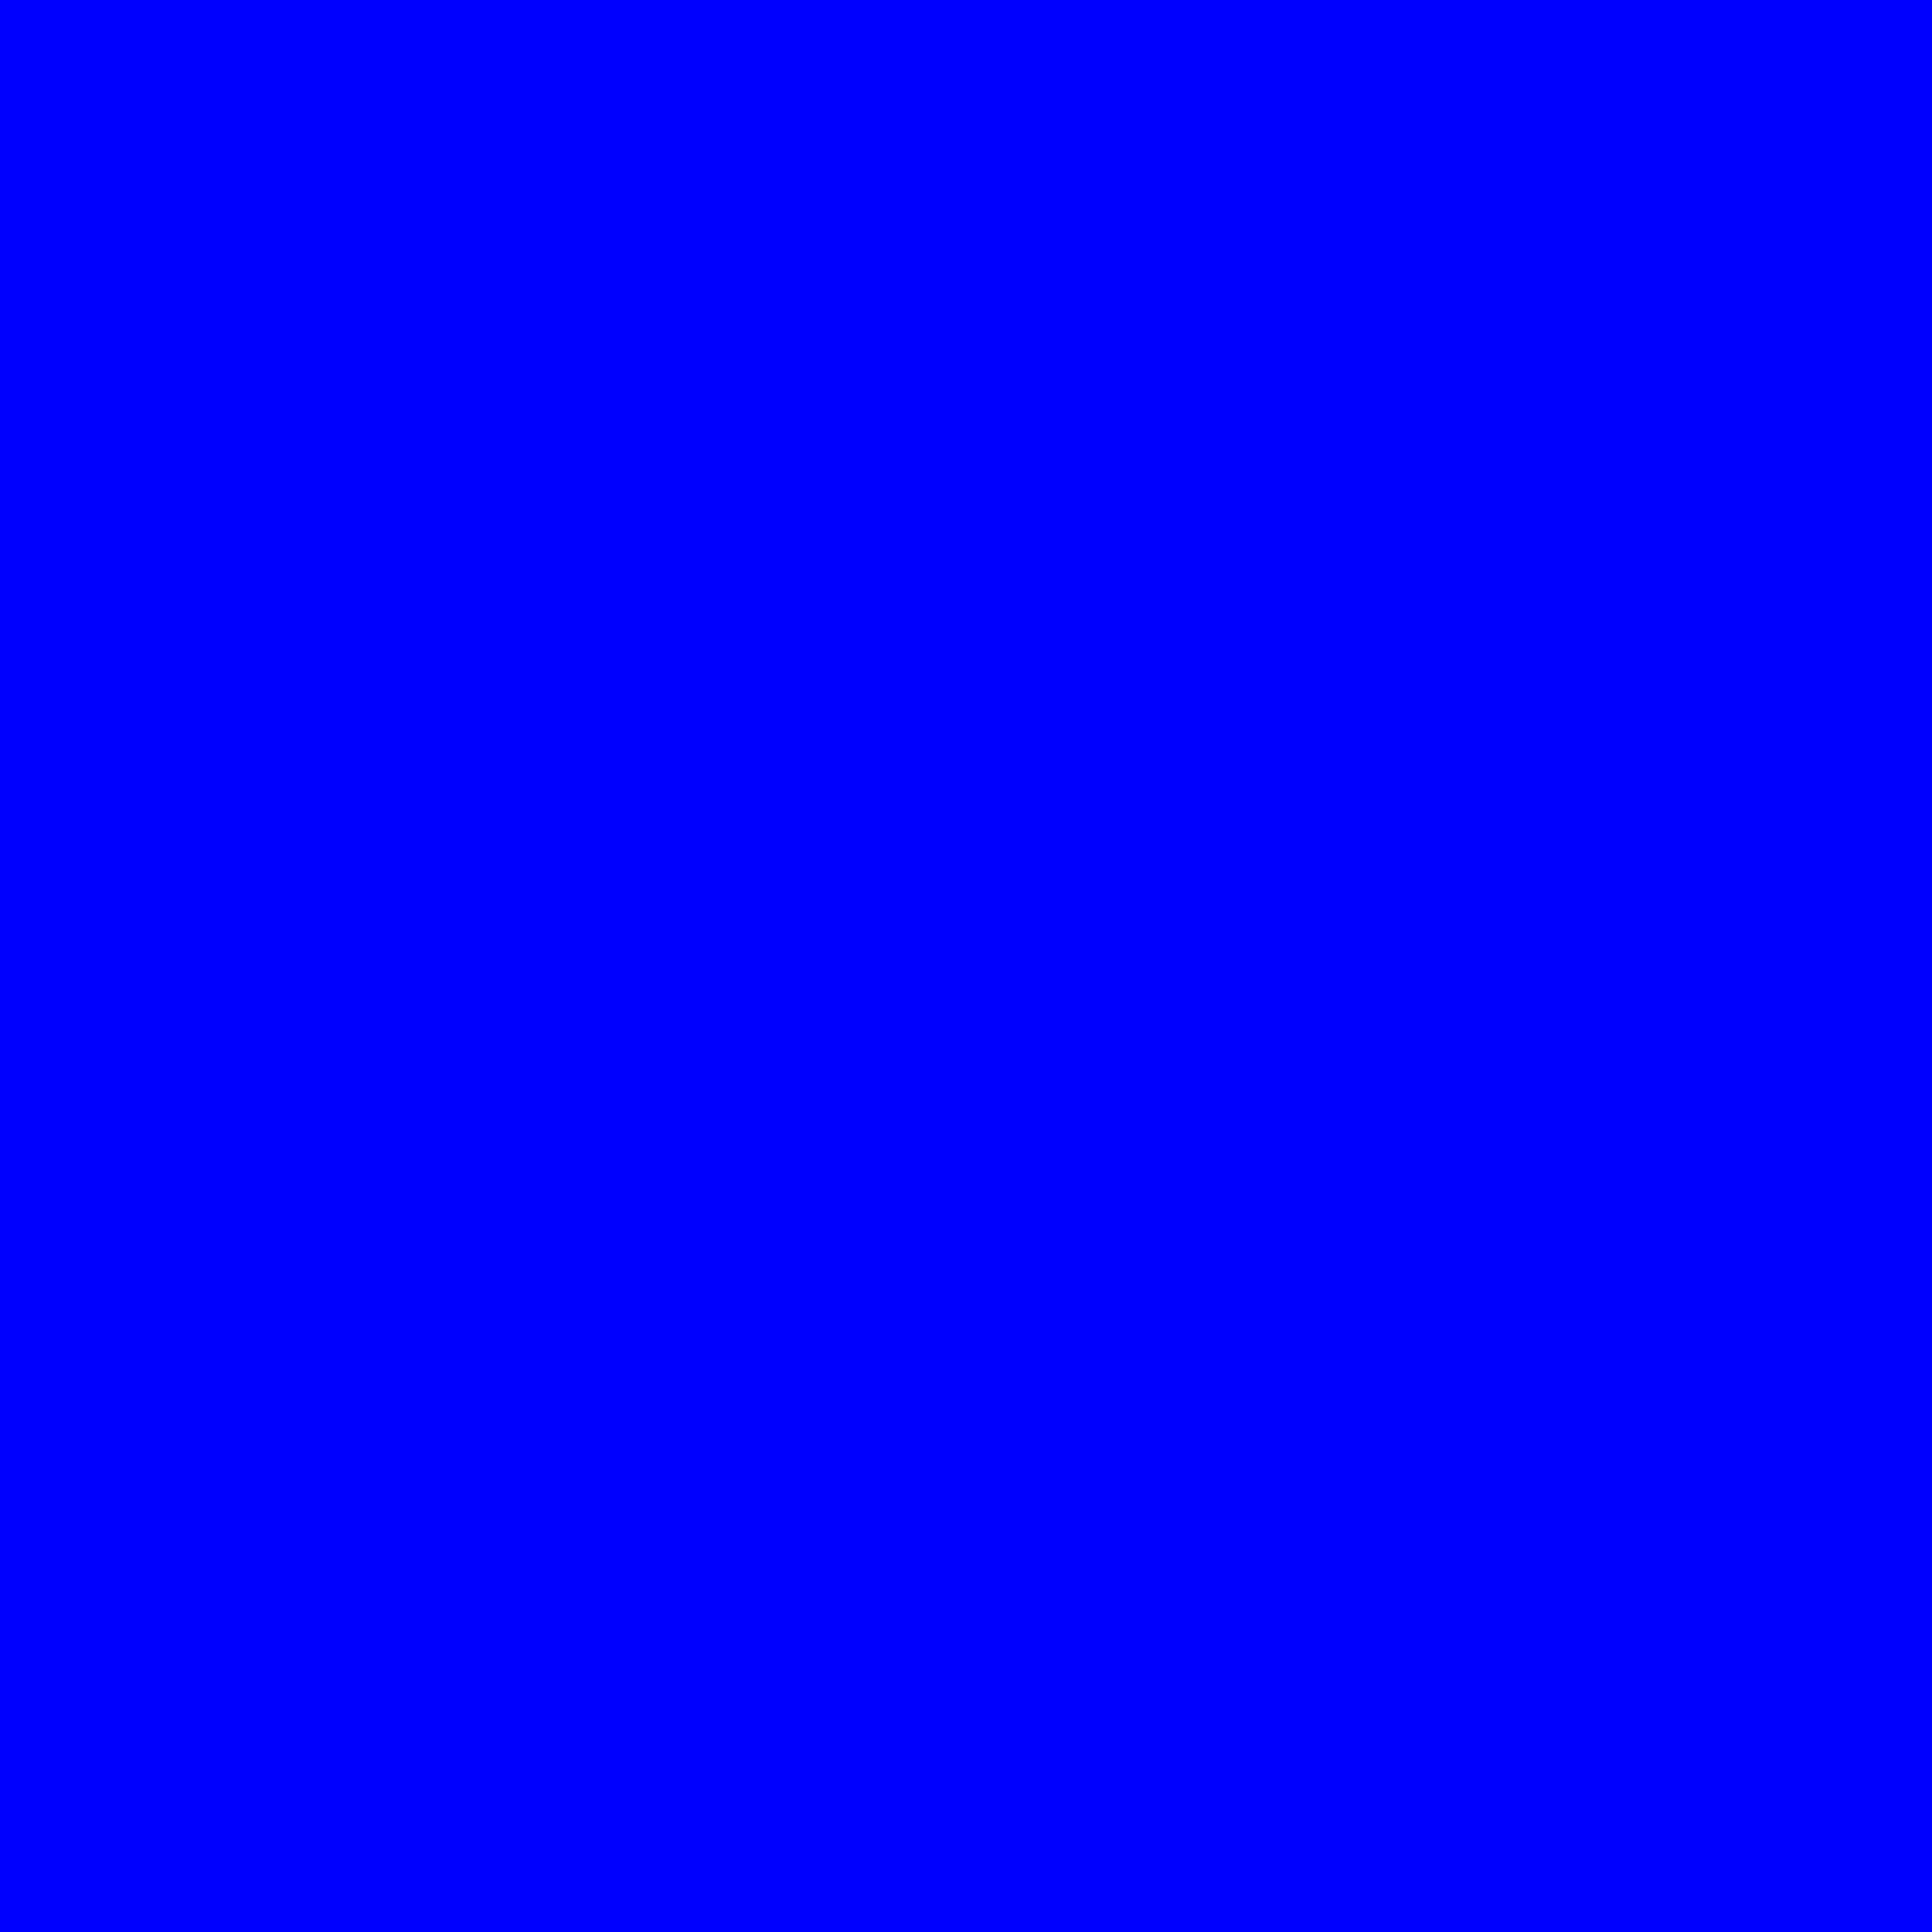 Blue Square Clipart.